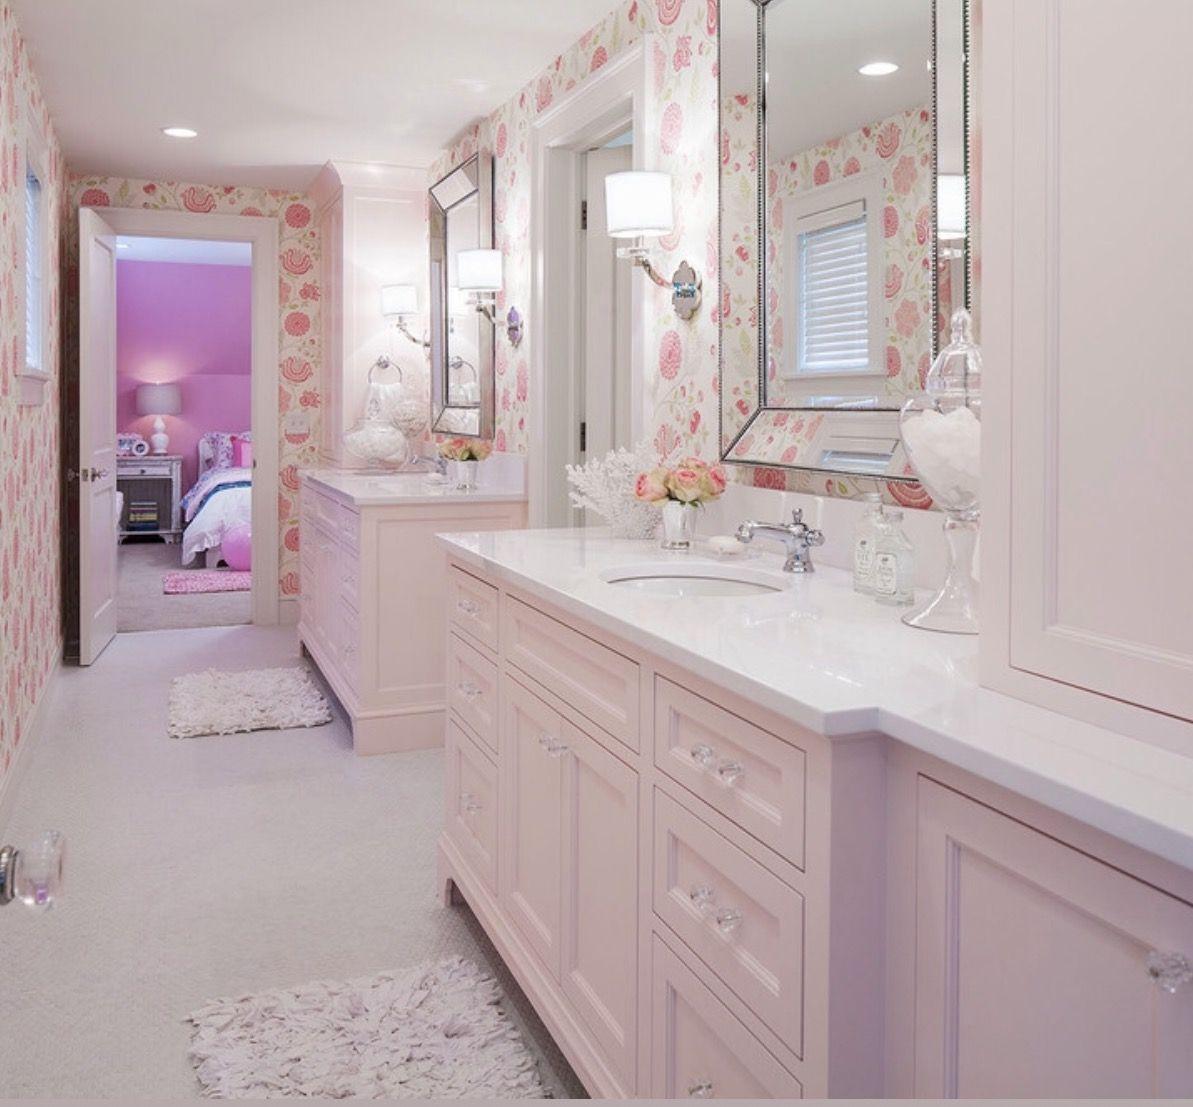 Jack n jill bathroom for girls  Girls bathroom design, Girl